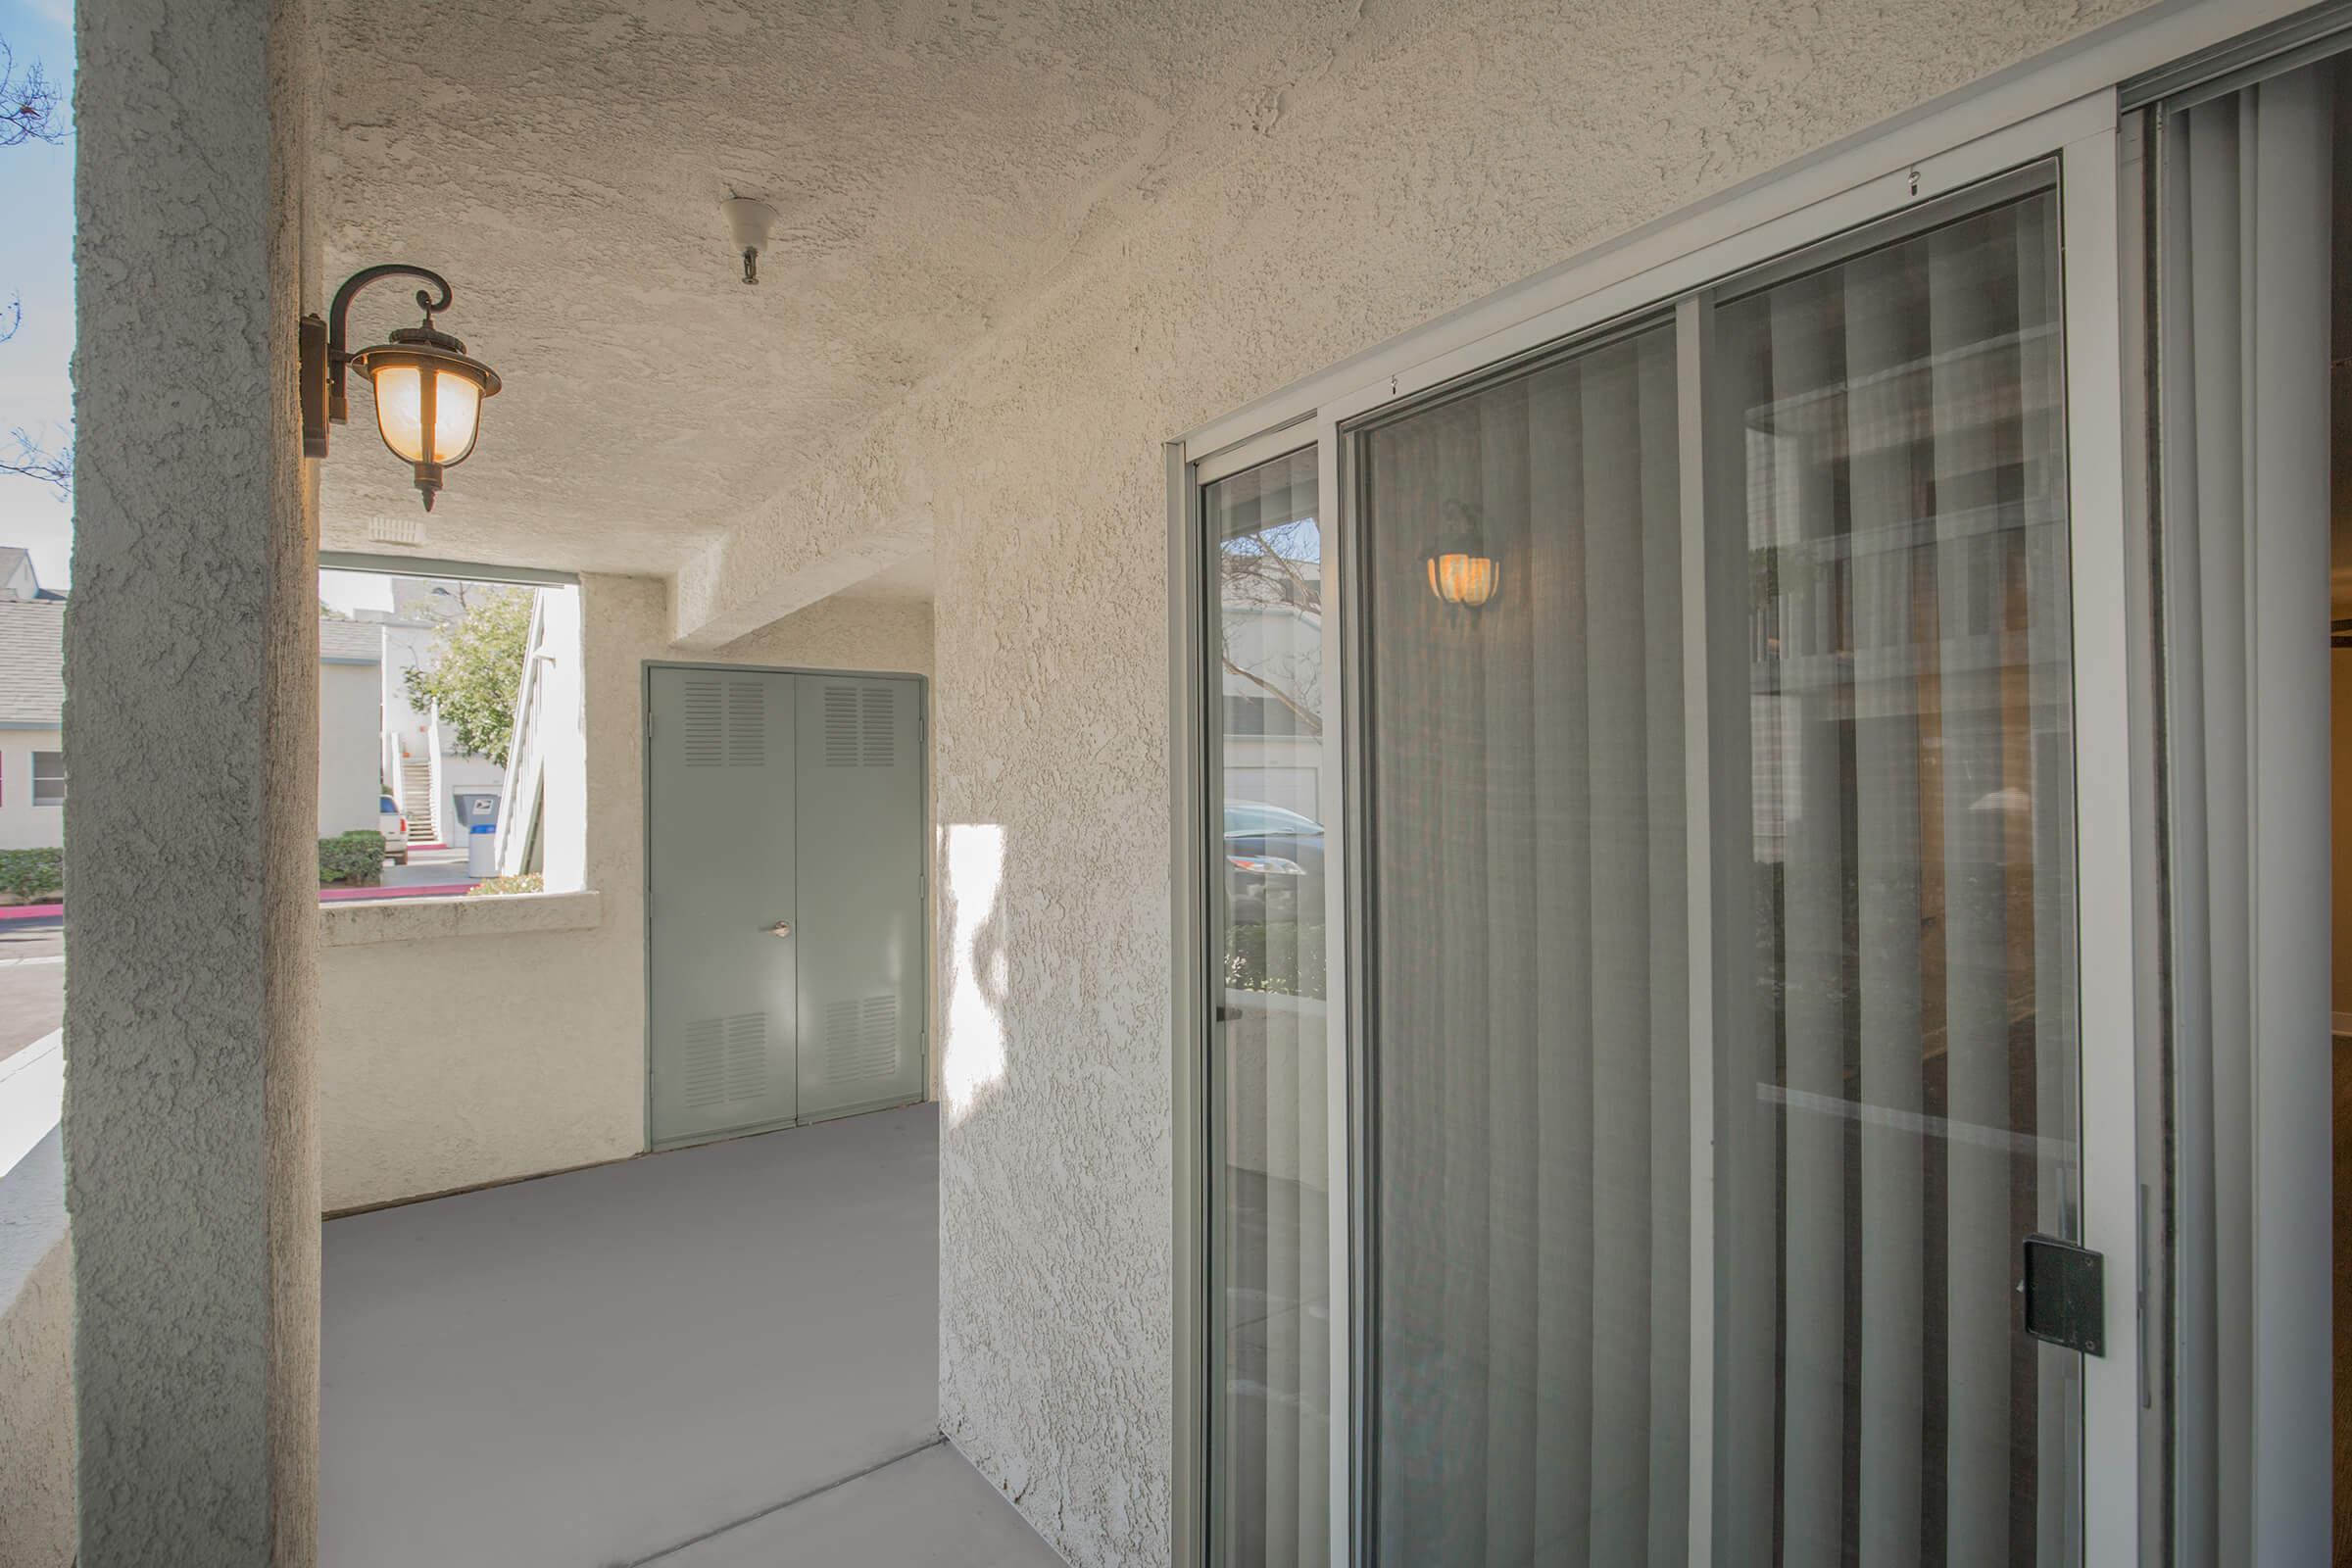 Patio with glass sliding doors